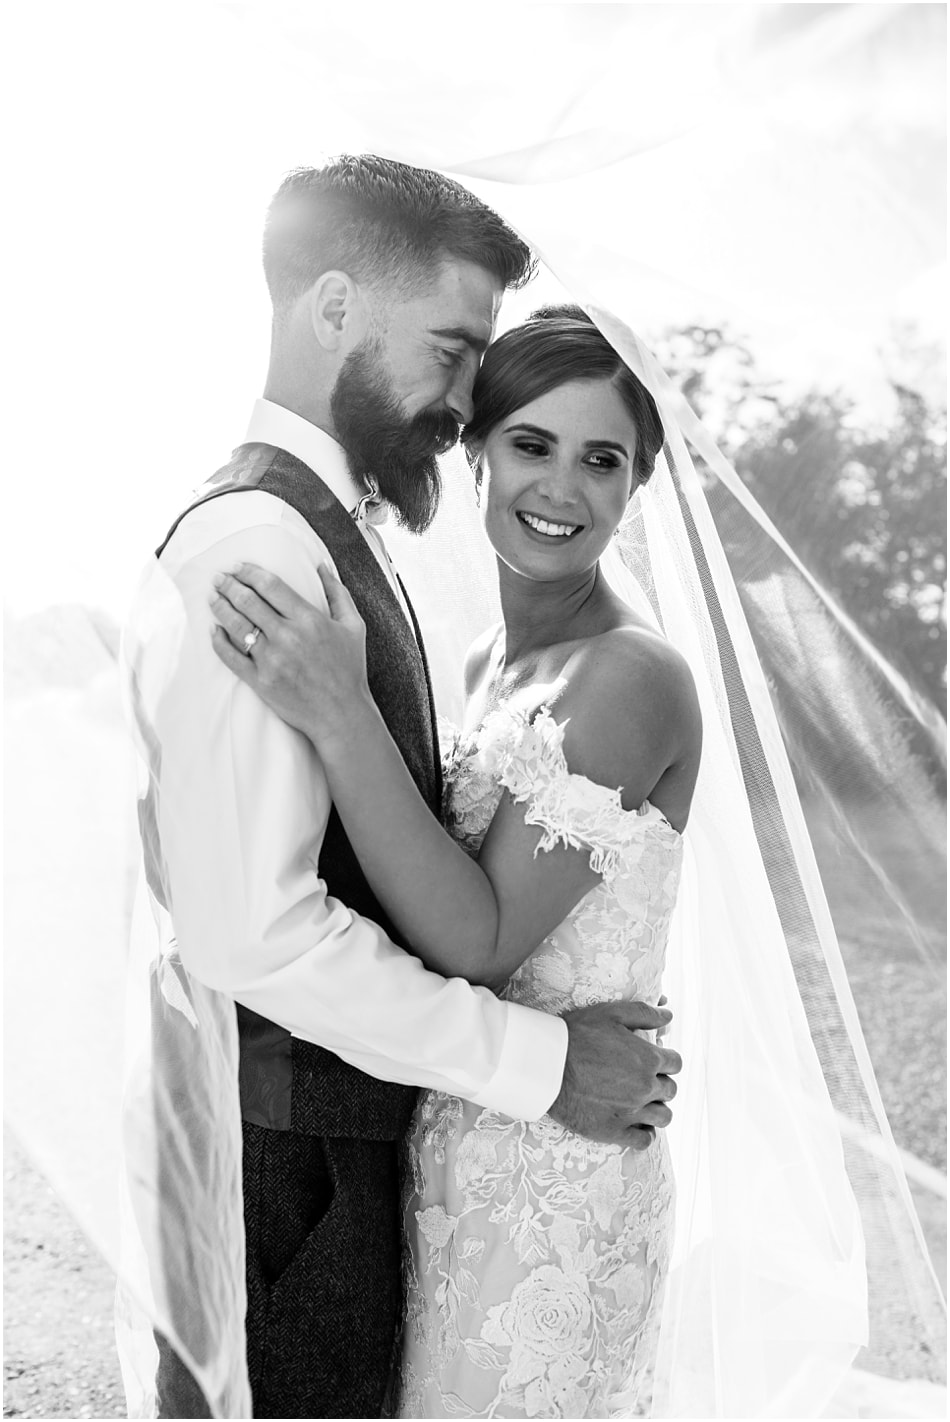 Shustoke Barn wedding photography | portrait of a Bride & Groom on their wedding day.